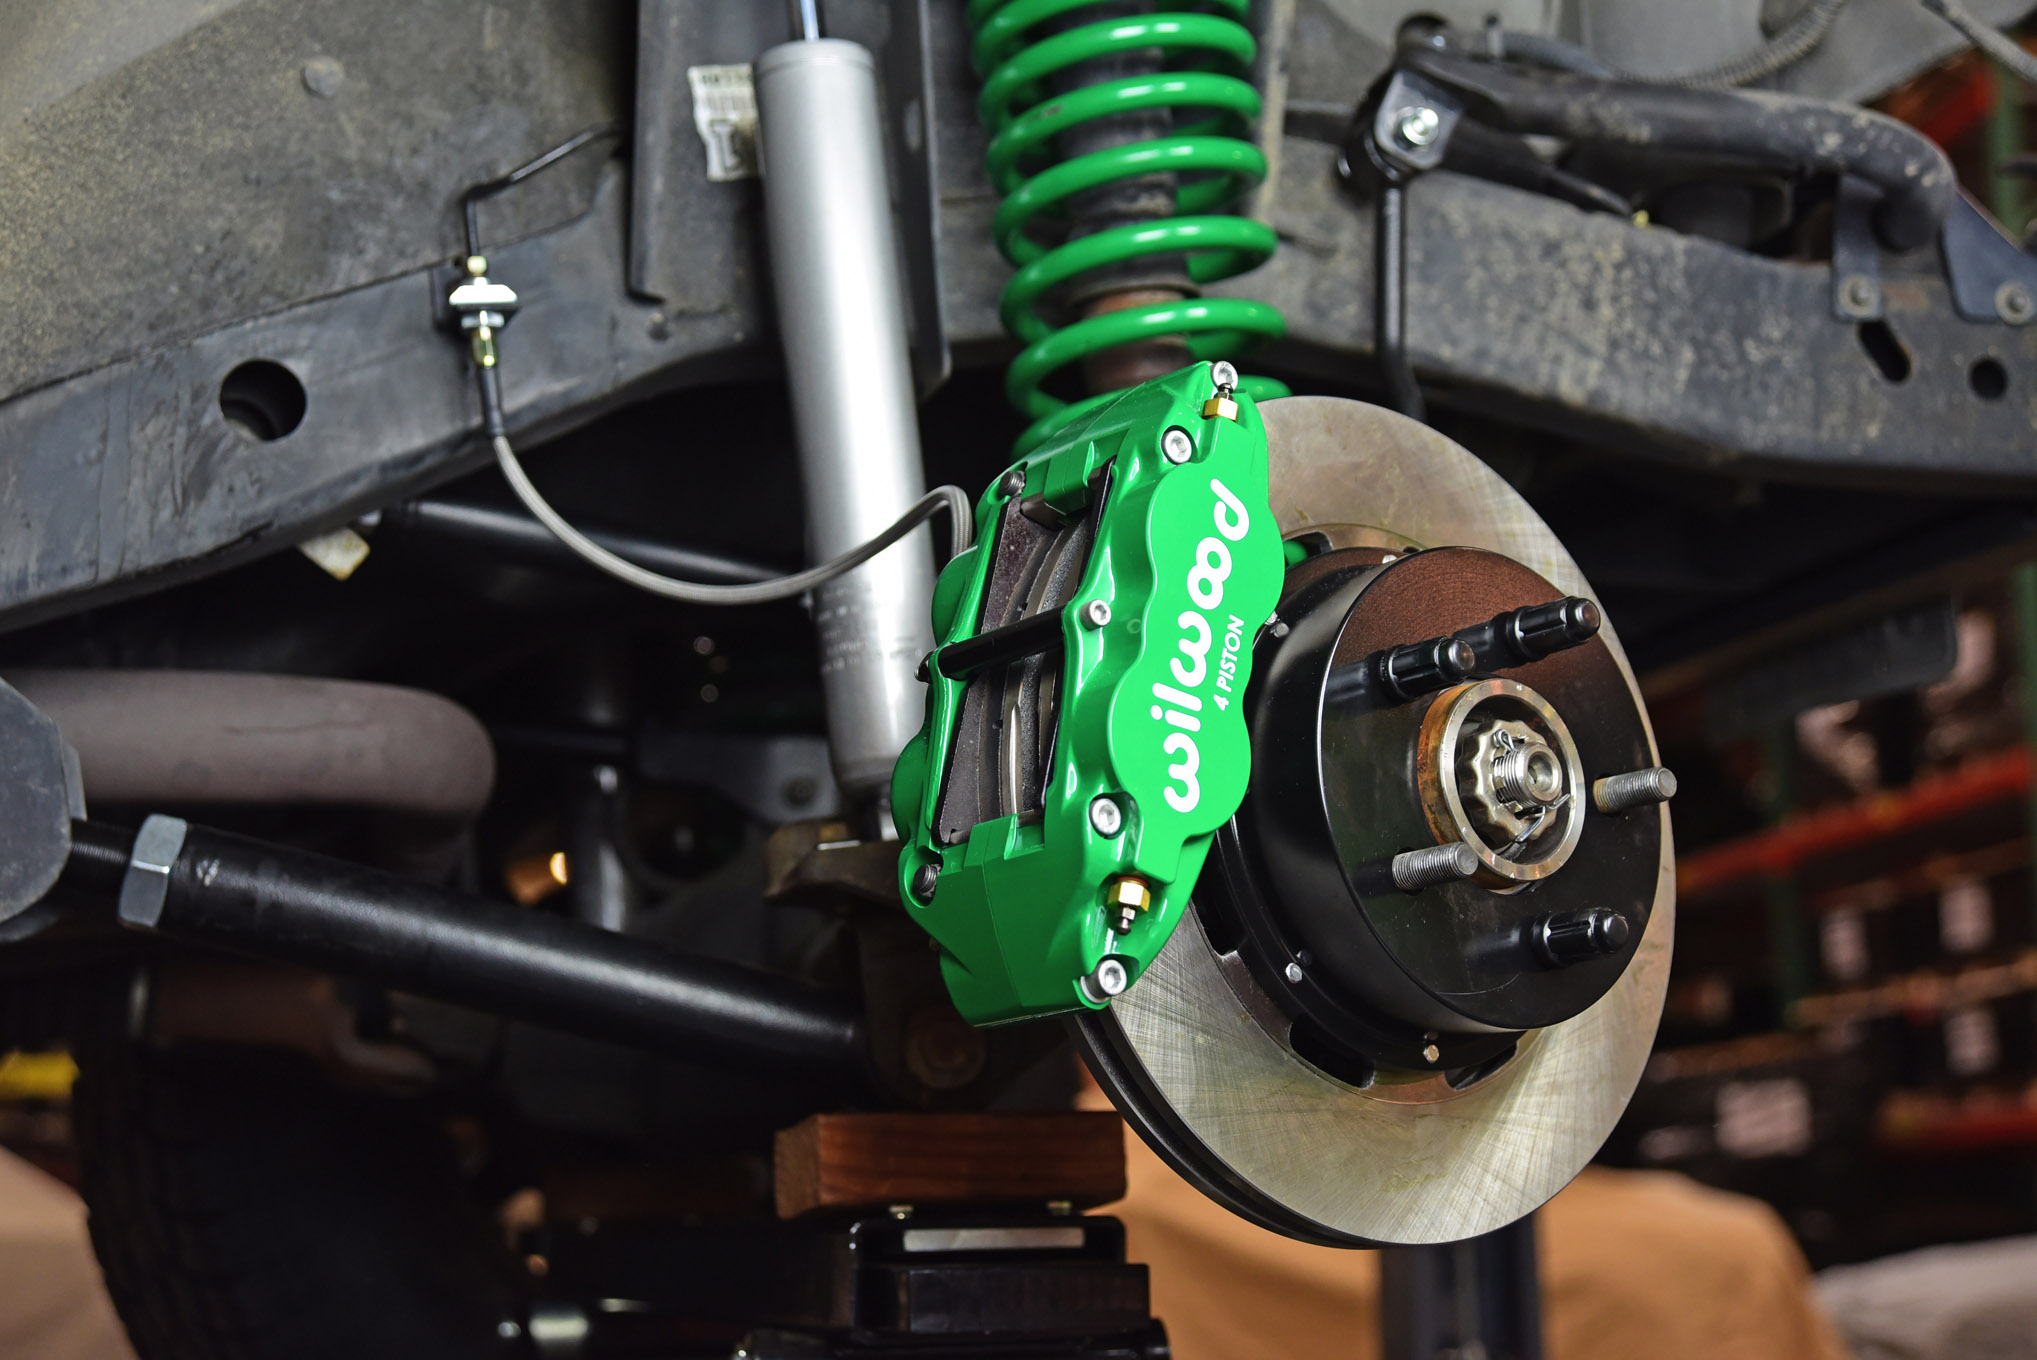 023 jeep tj wrangler wilwood engineering brakes front disc upgrade kit